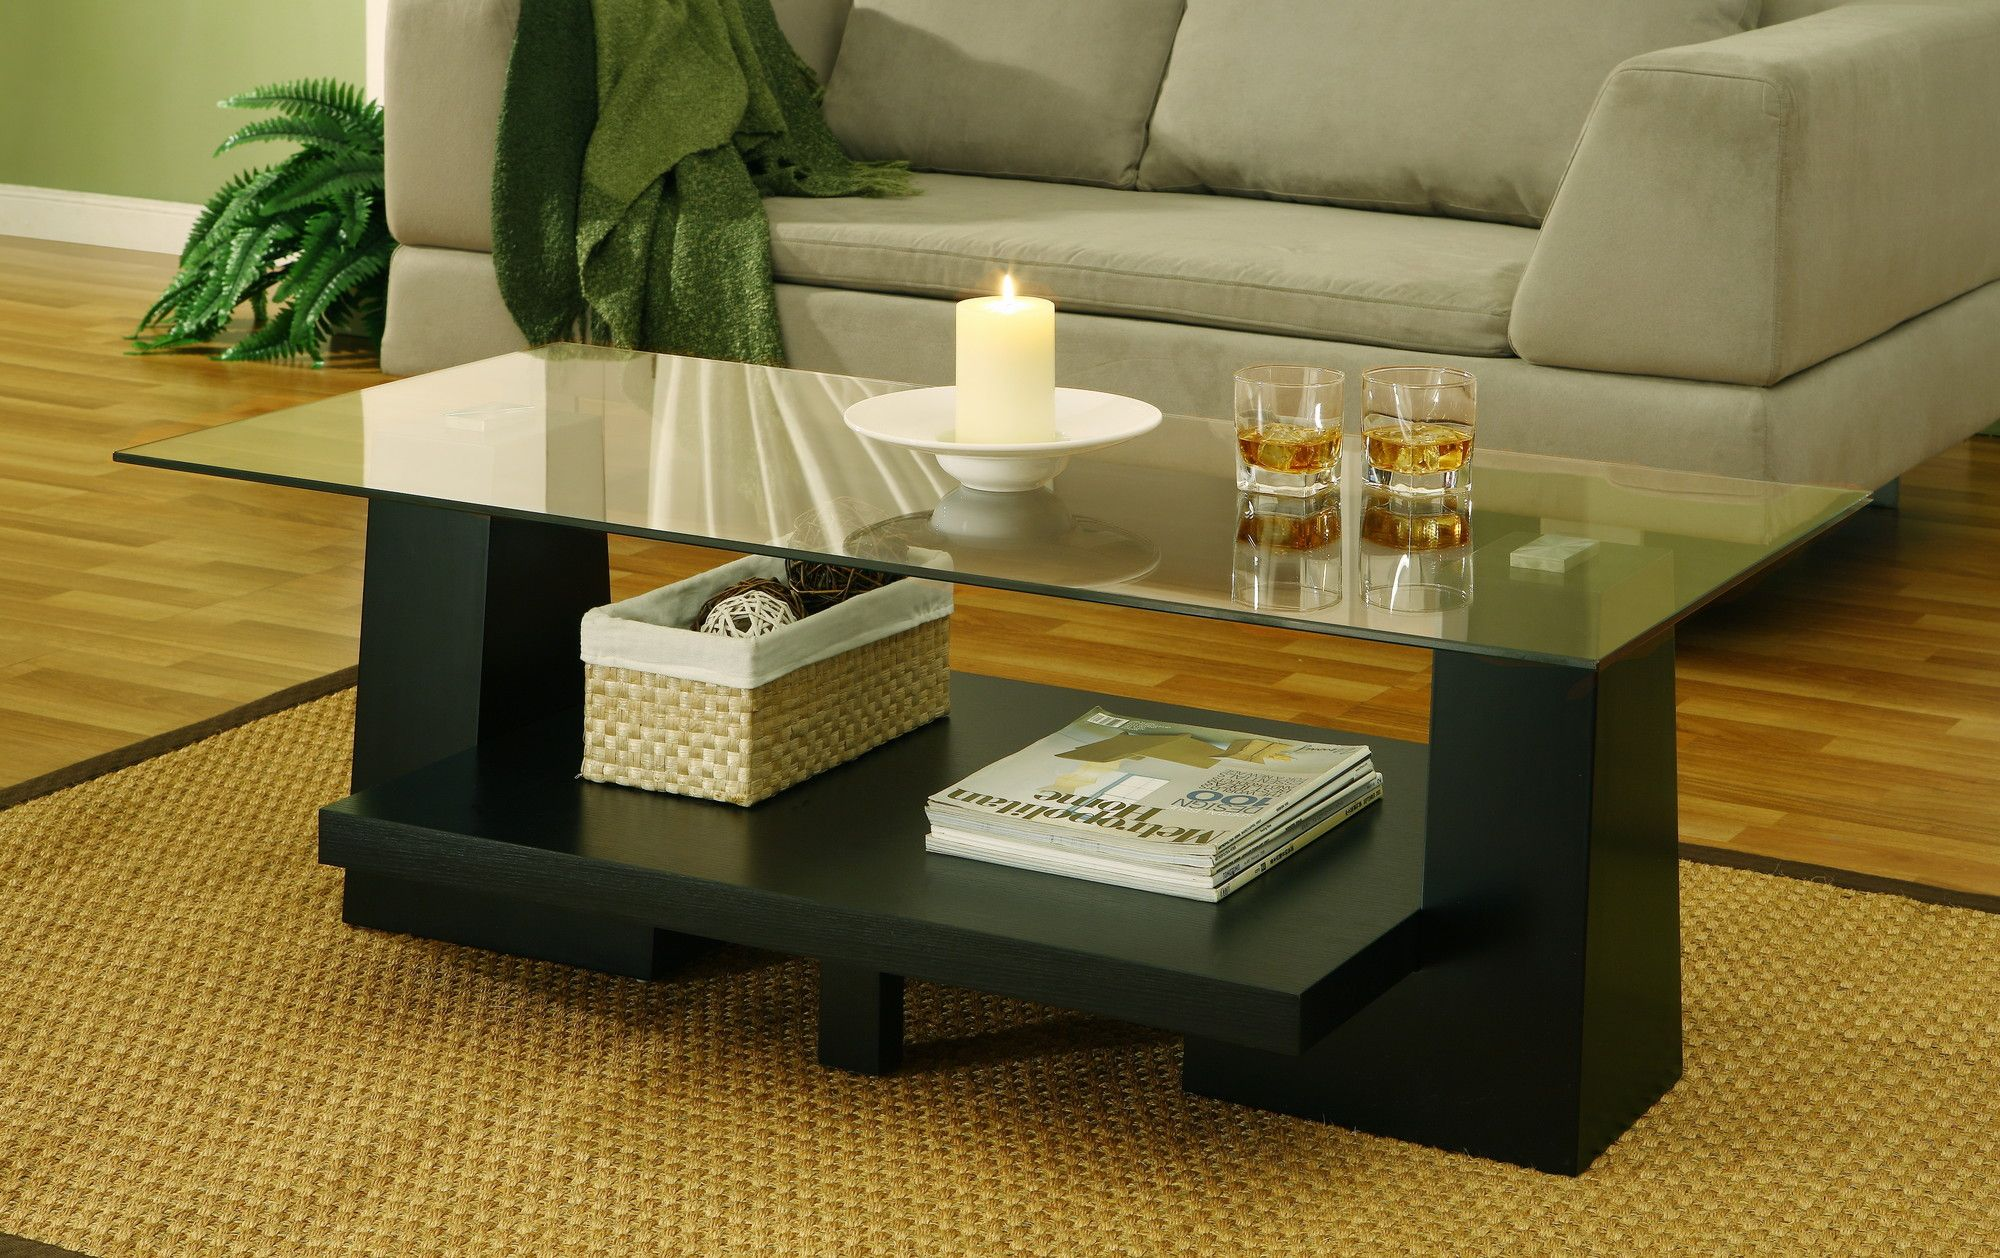 Arius Coffee Table Living Room Coffee Table Coffee Table Glass Coffee Tables Living Room [ 1258 x 2000 Pixel ]